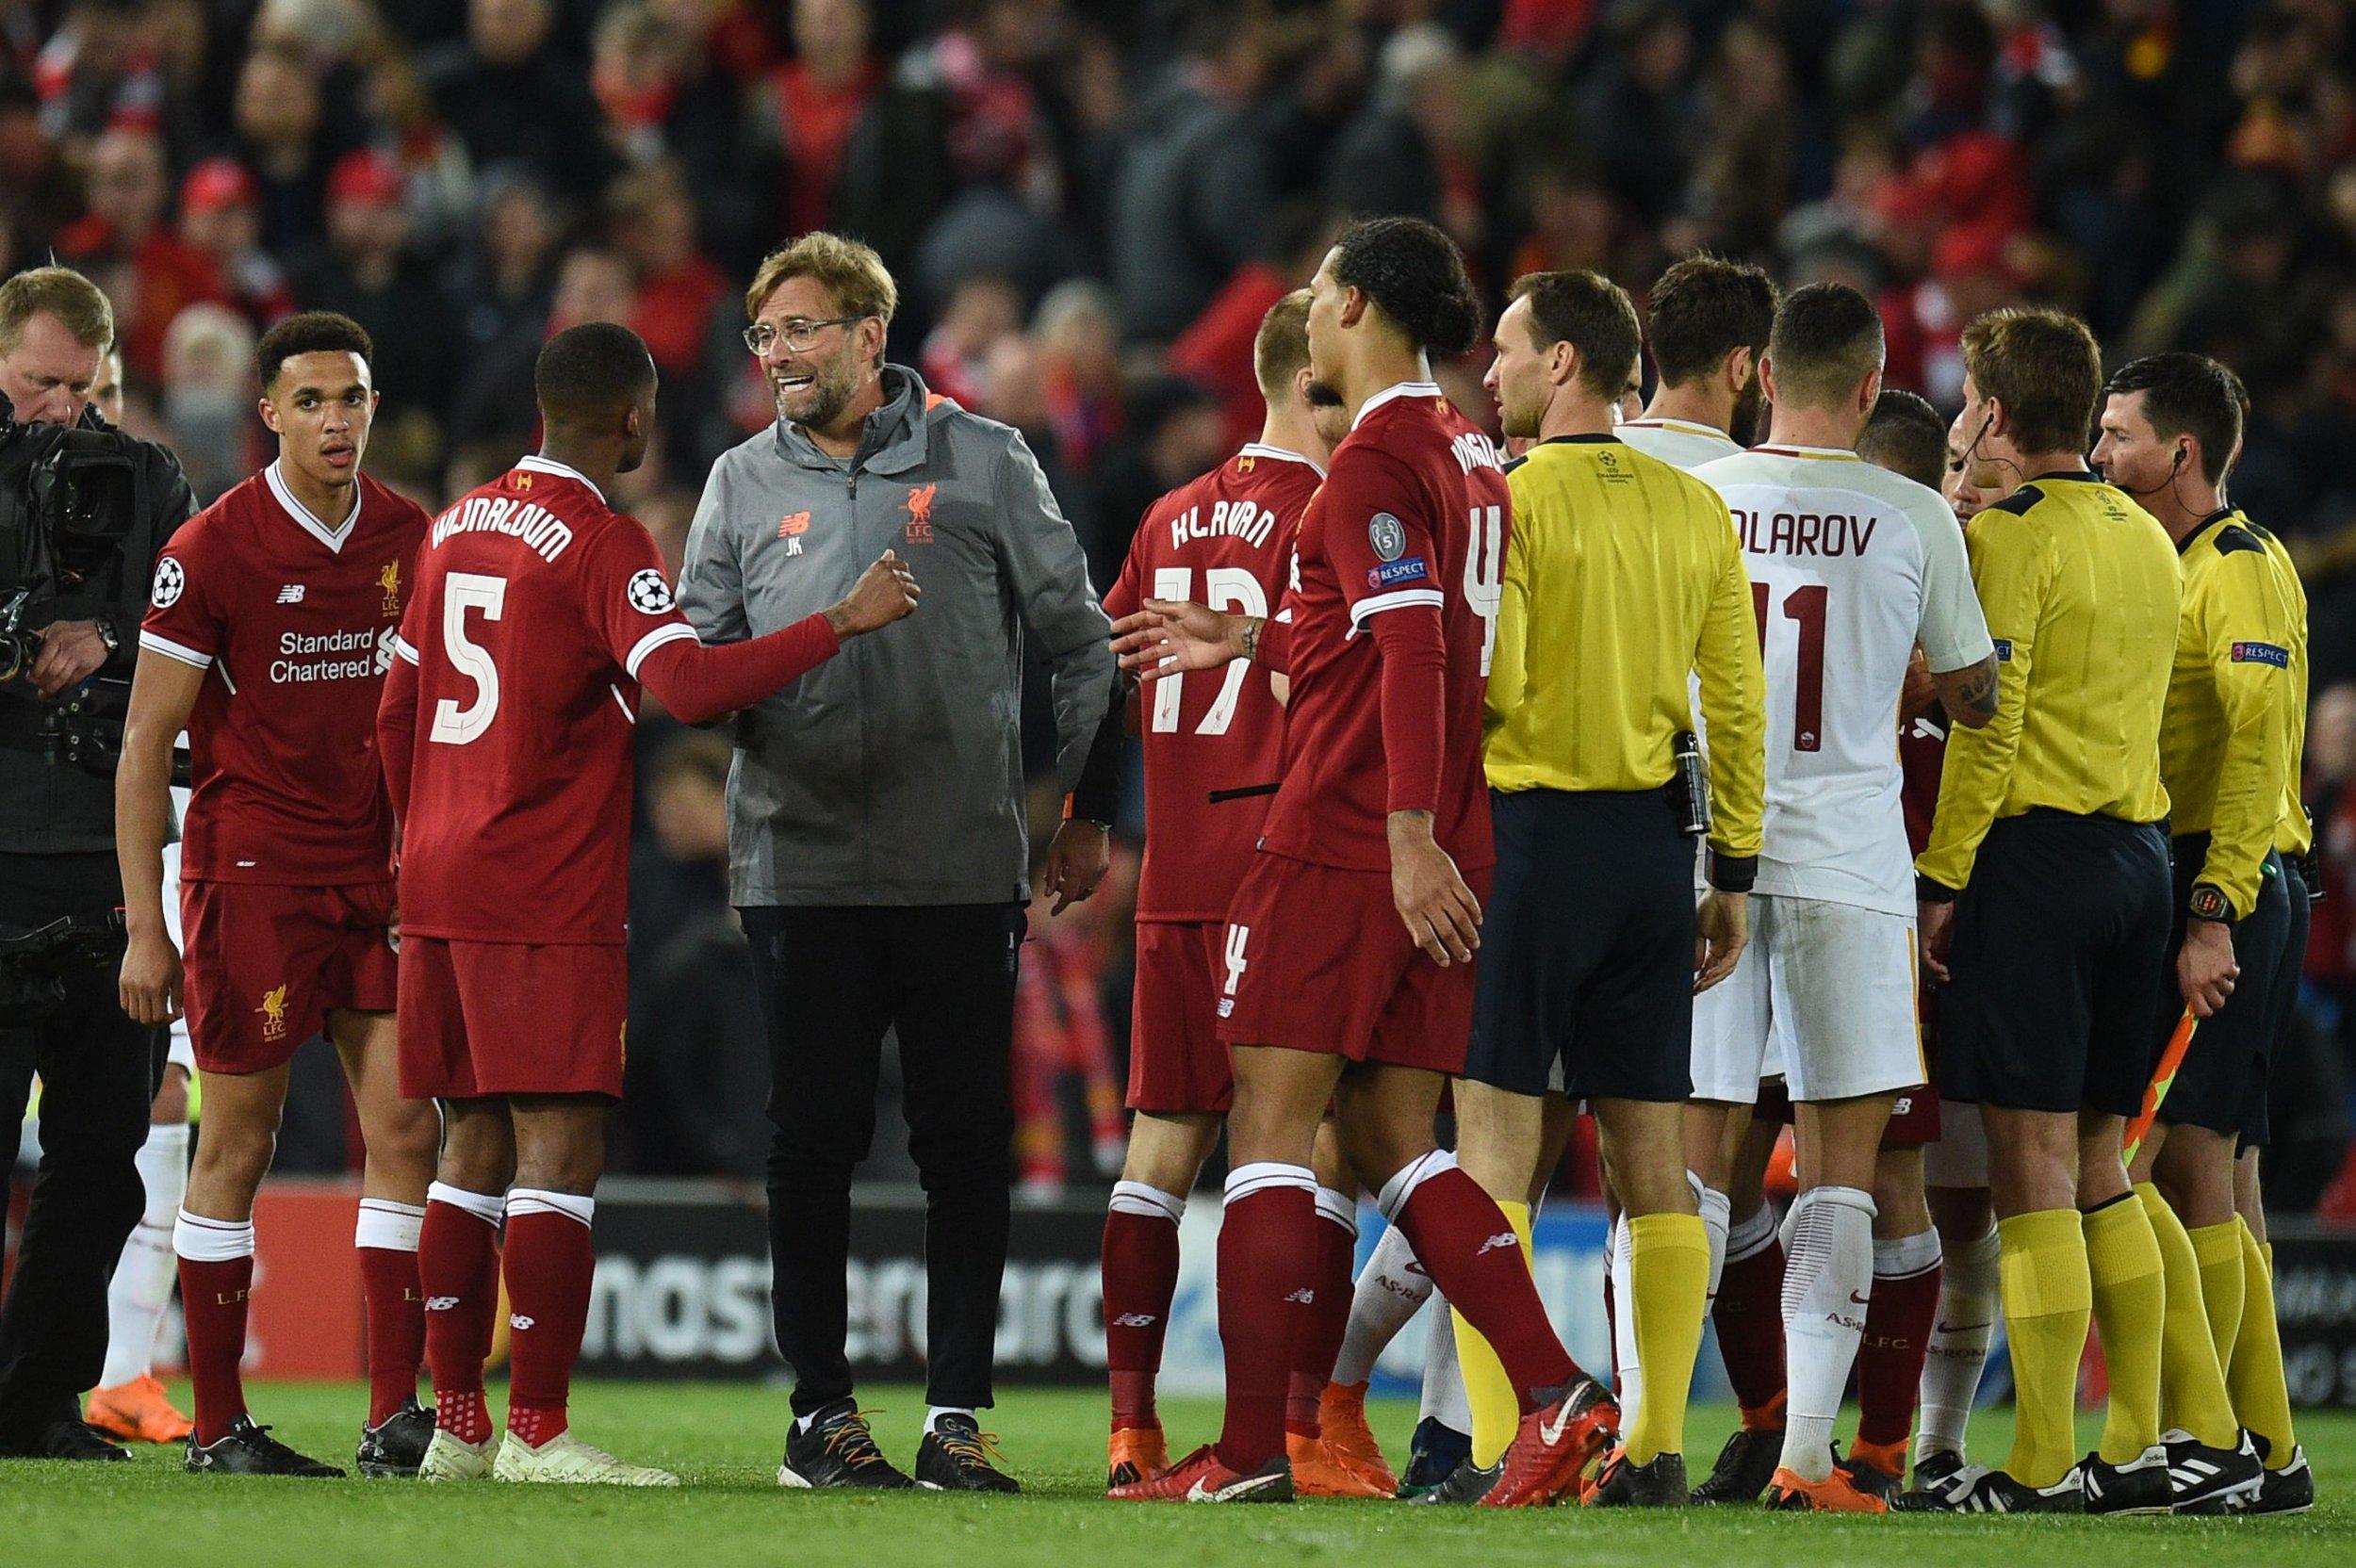 Jurgen Klopp speech saved Liverpool's Champions League campaign, says Georginio Wijnaldum